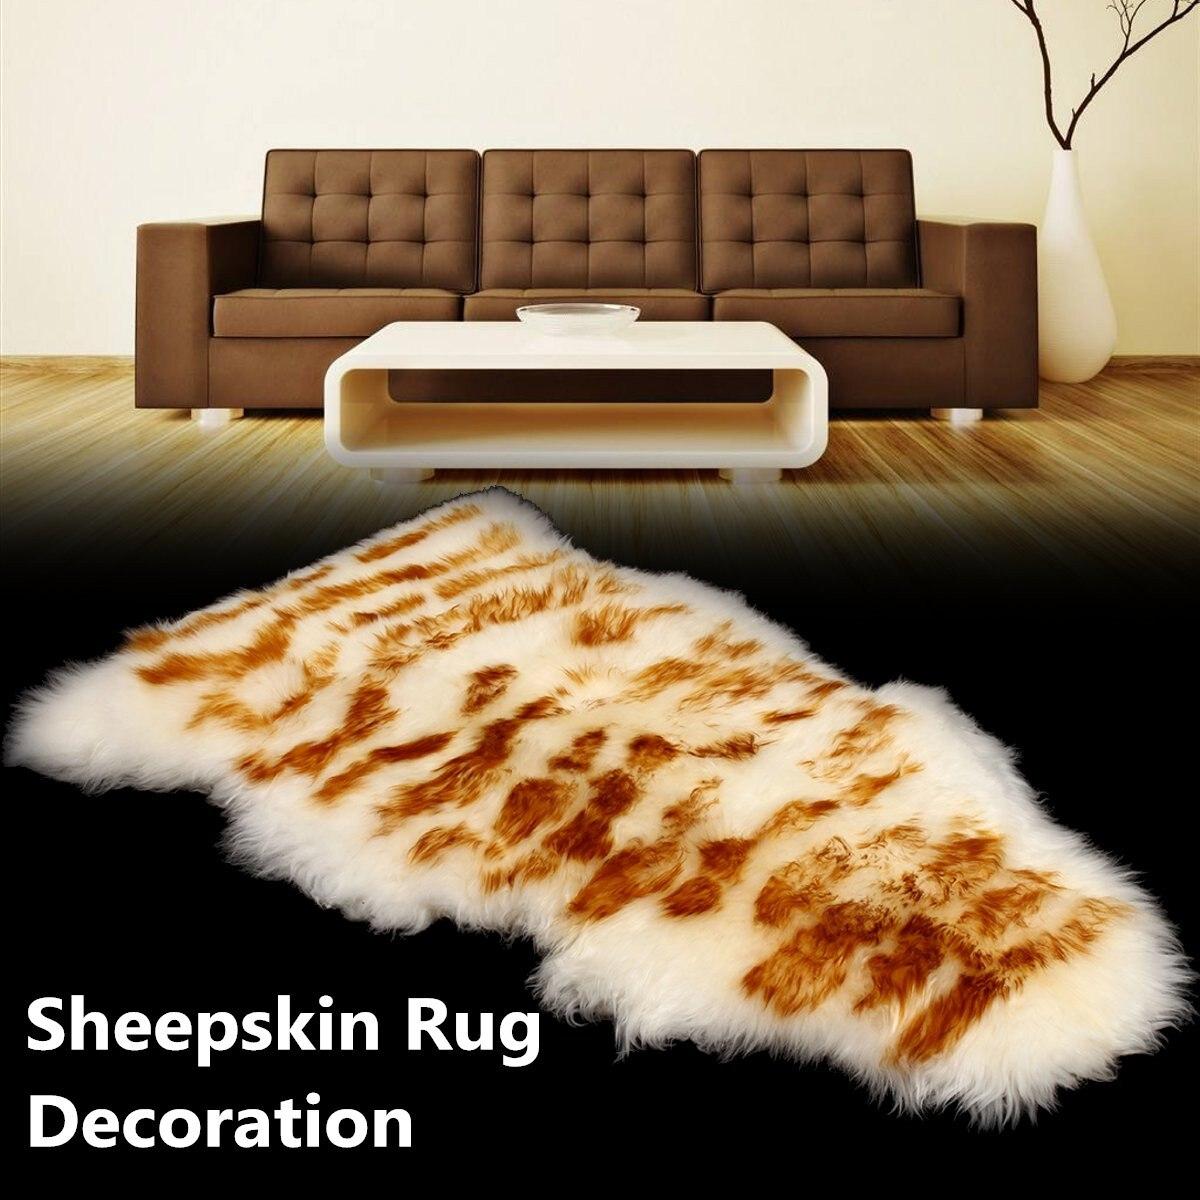 New 75*200cm Imitation Sheepskin Rug Woolen Sofa Carpet Floor Mat Whole Wool Seat Mat Bay Window Living Room Bedroom Blanket